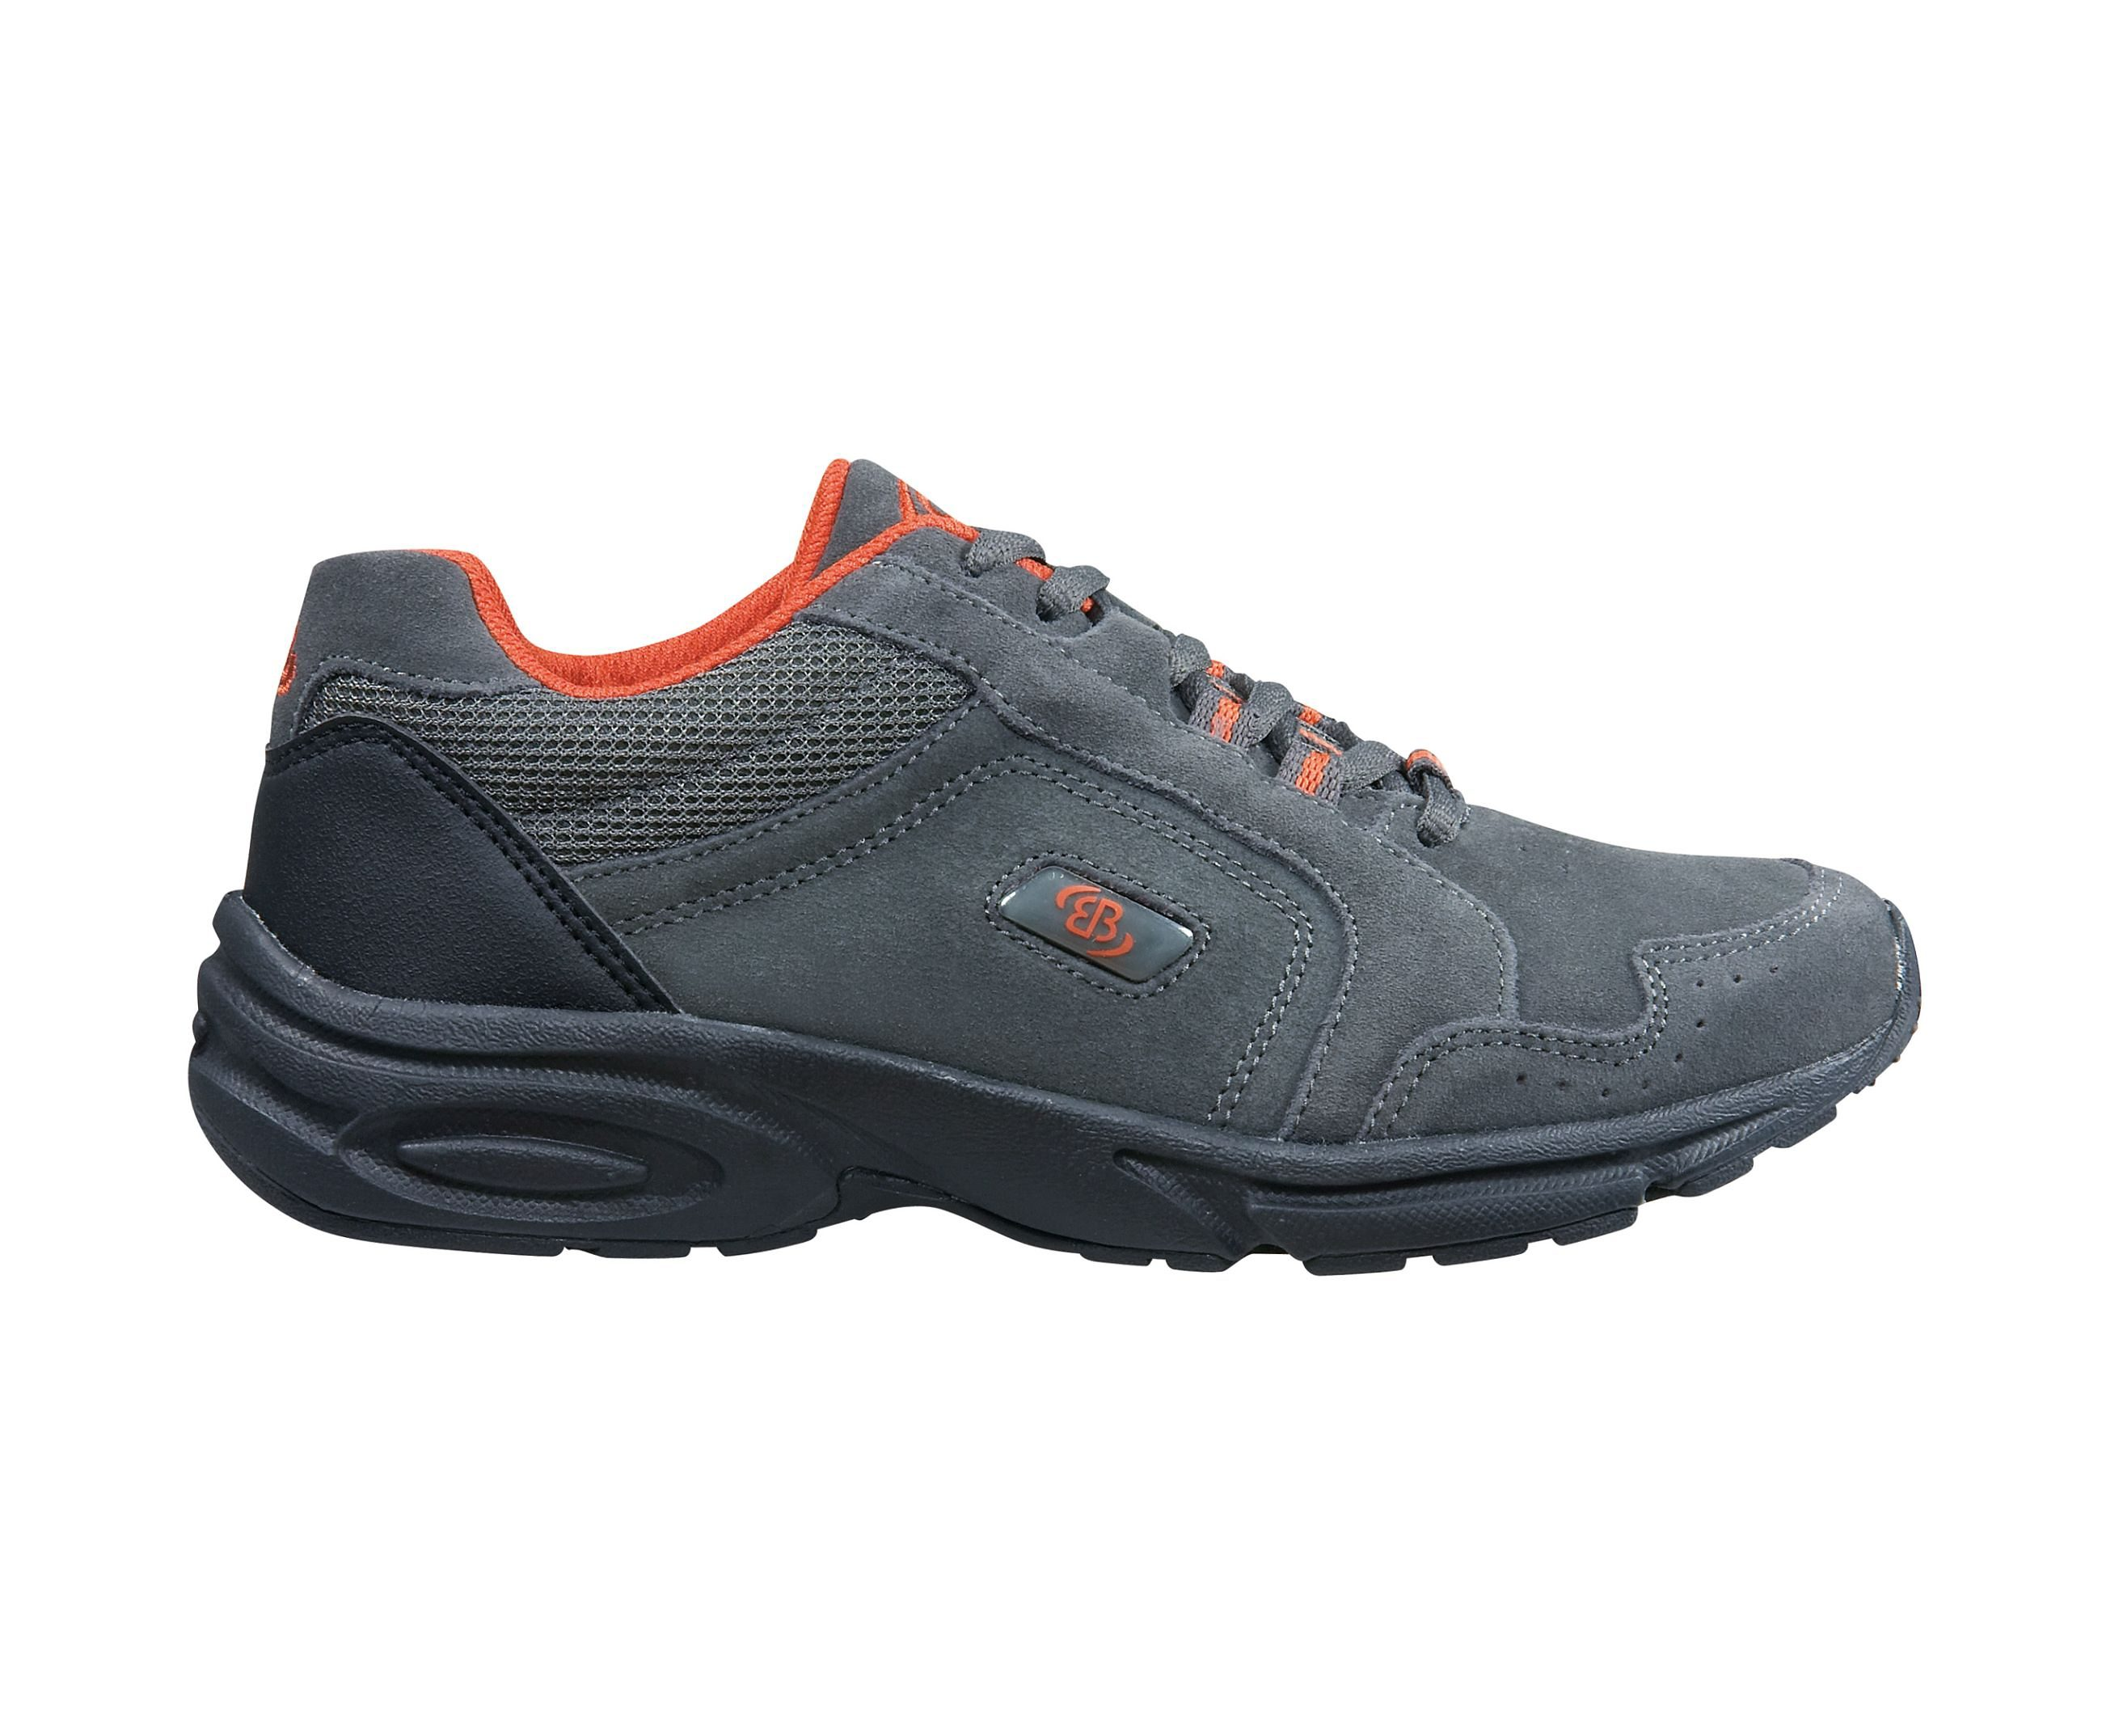 Brütting Nordic Walking Schuh aus Veloursleder CIRCLE online kaufen  anthrazit#ft5_slash#orange